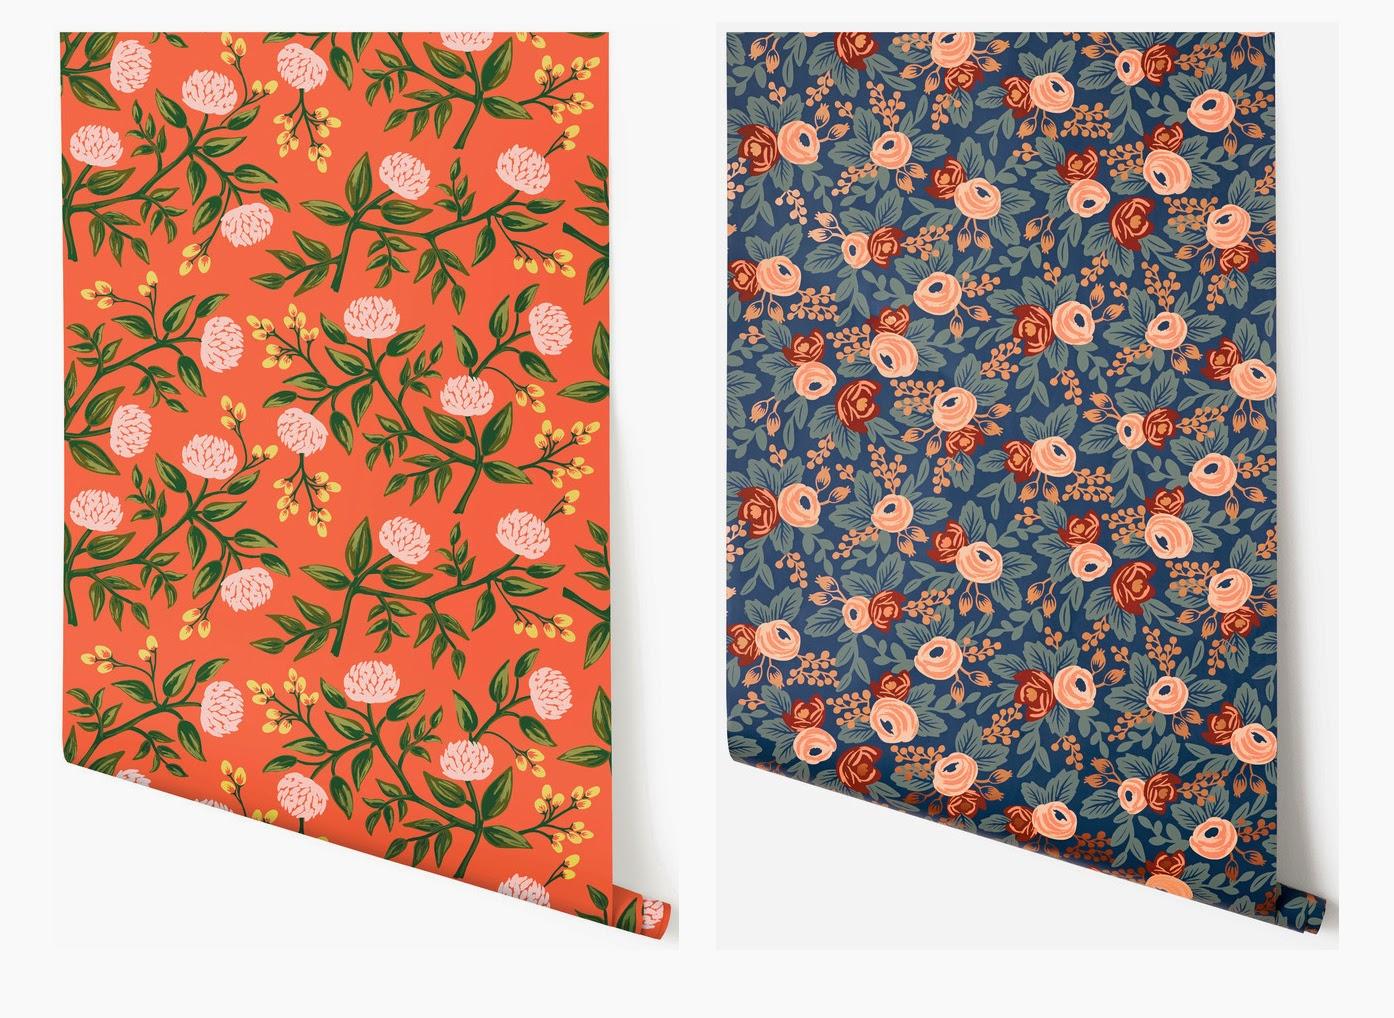 [49+] Rifle Paper Co Pineapple Wallpaper on WallpaperSafari